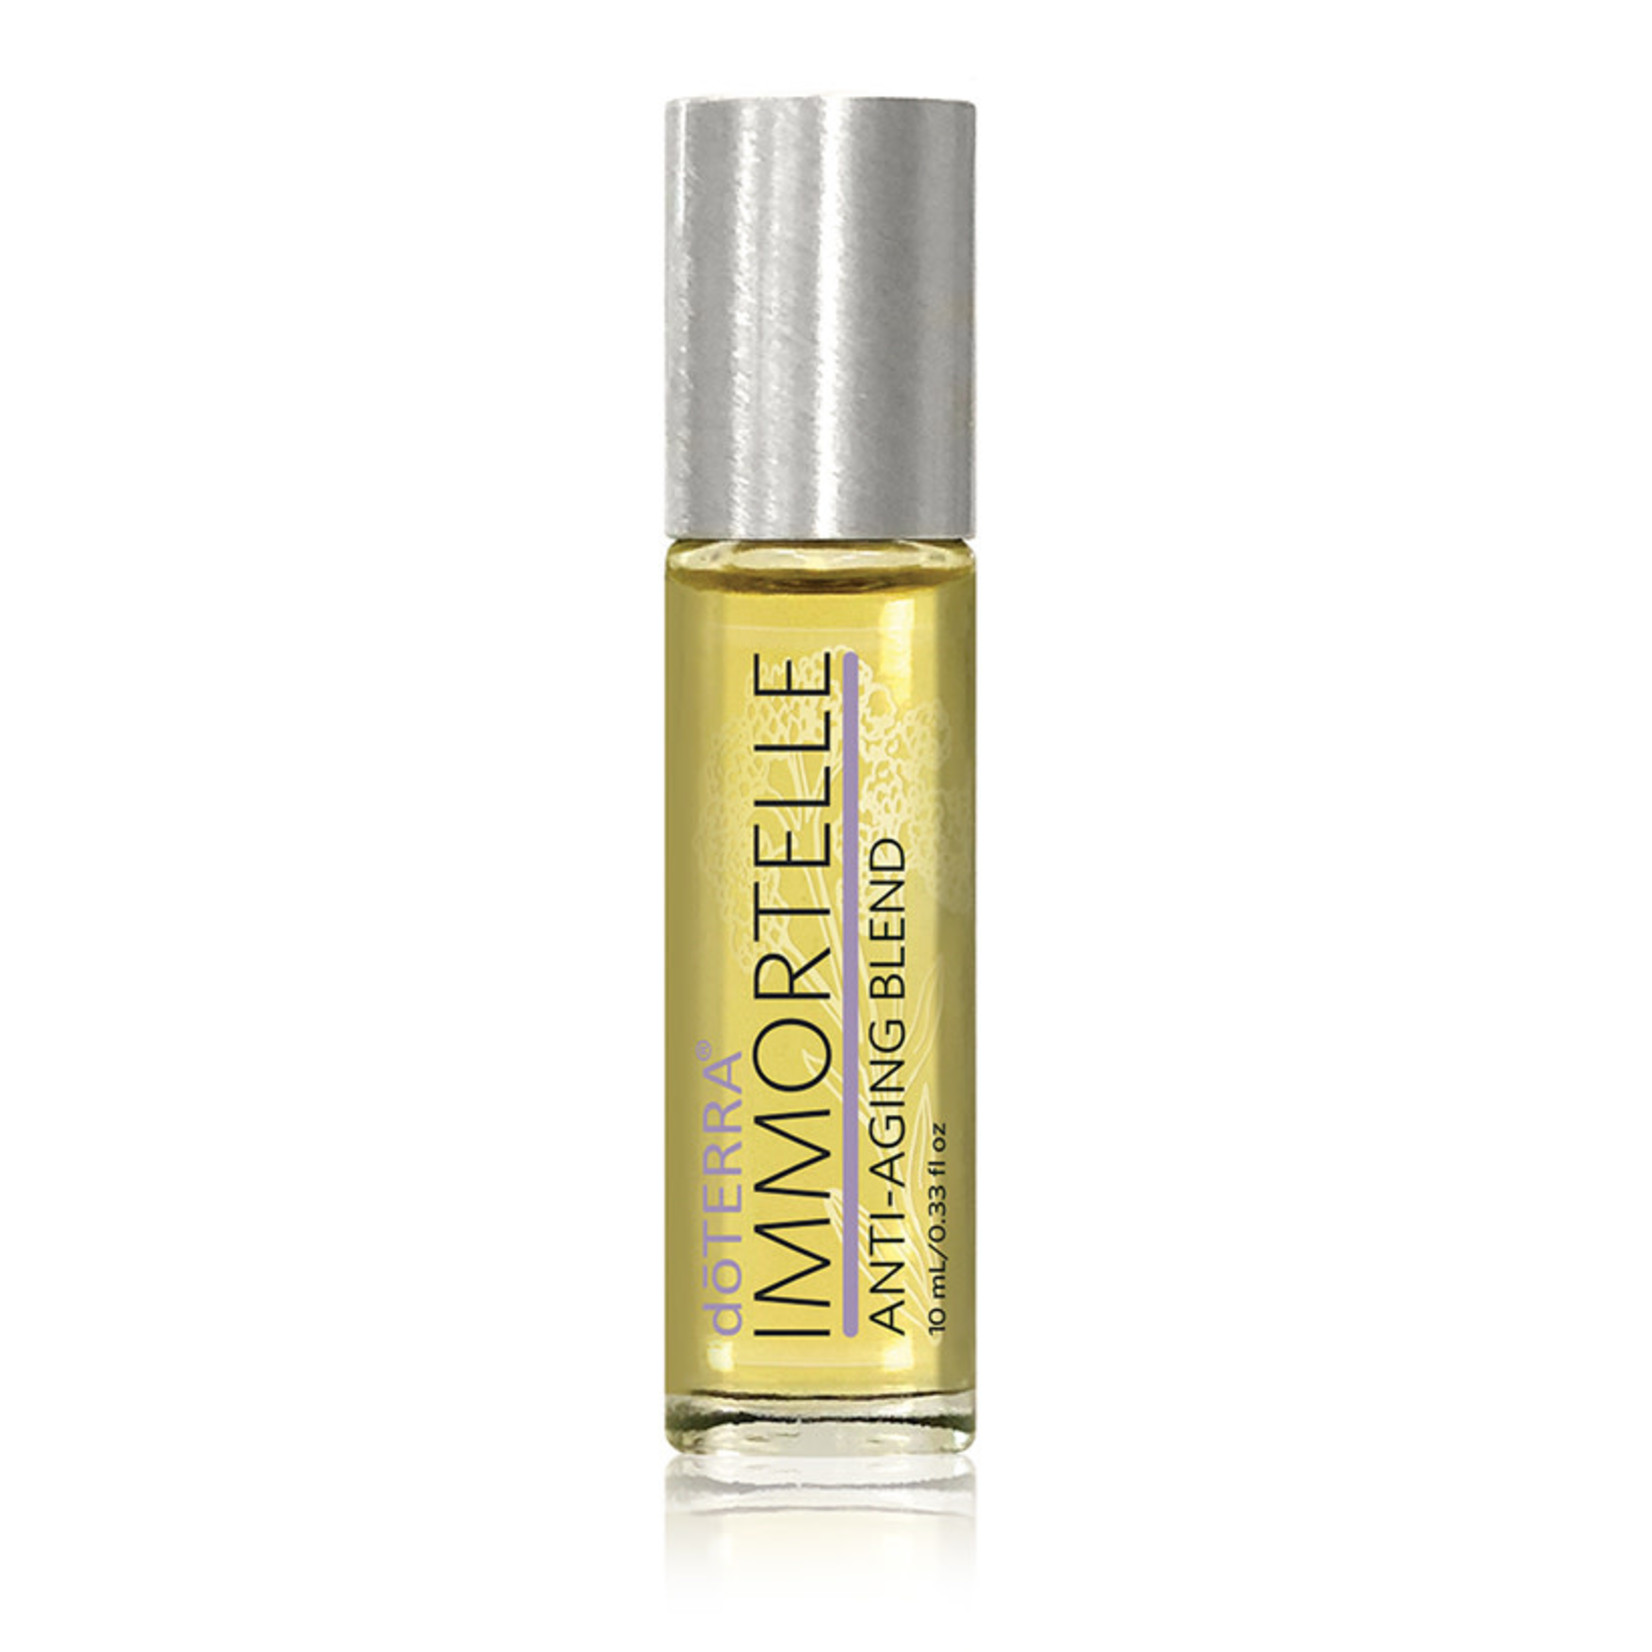 doTERRA doTerra Essential Oil Immortelle - Anti Aging Blend